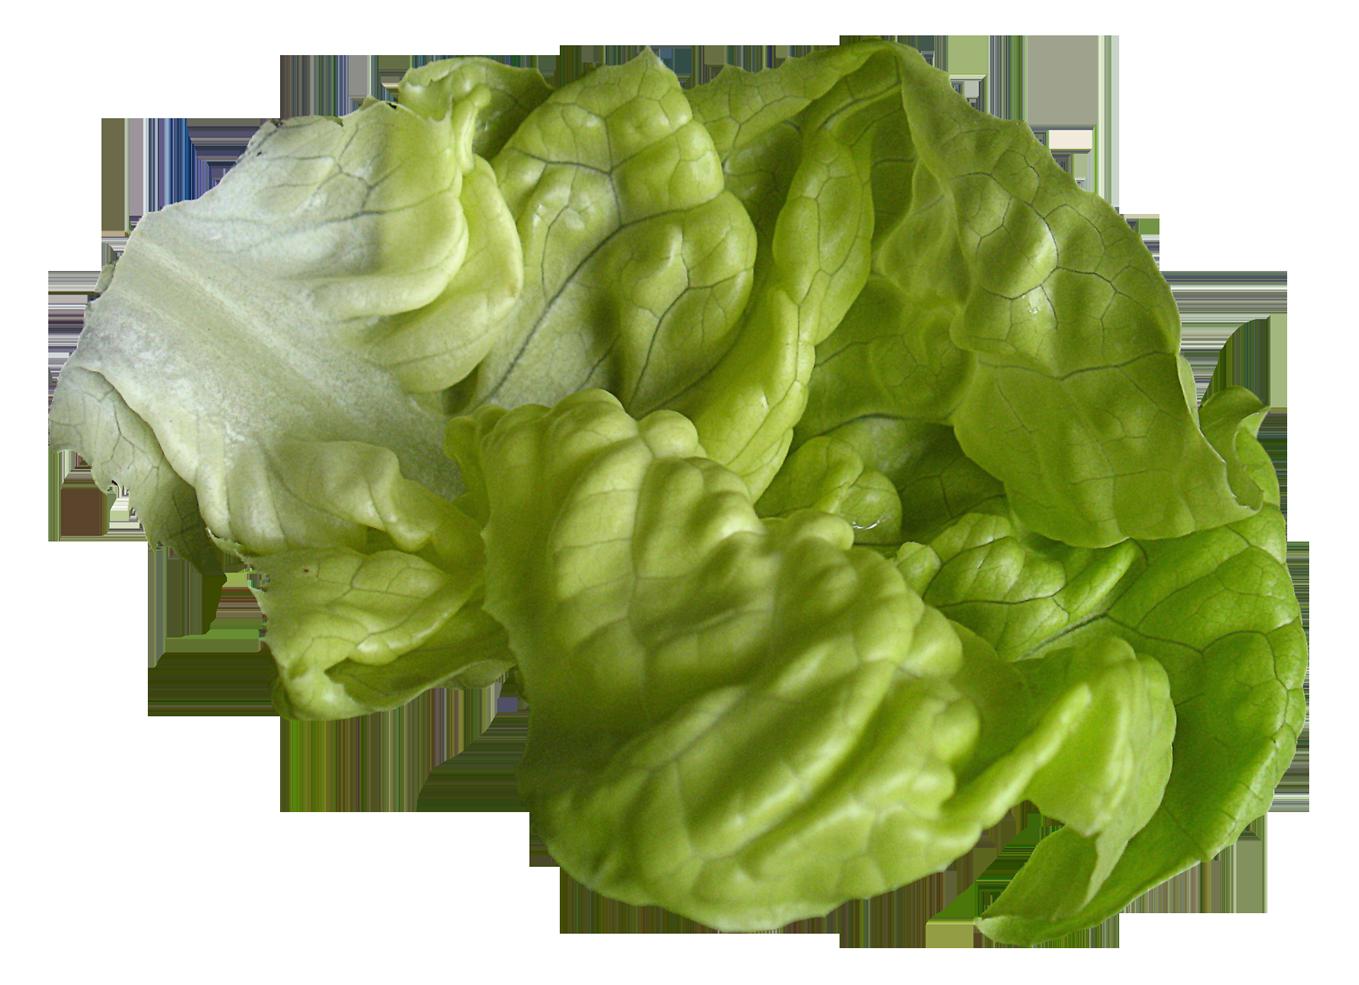 Png image purepng free. Lettuce clipart lettuce slice